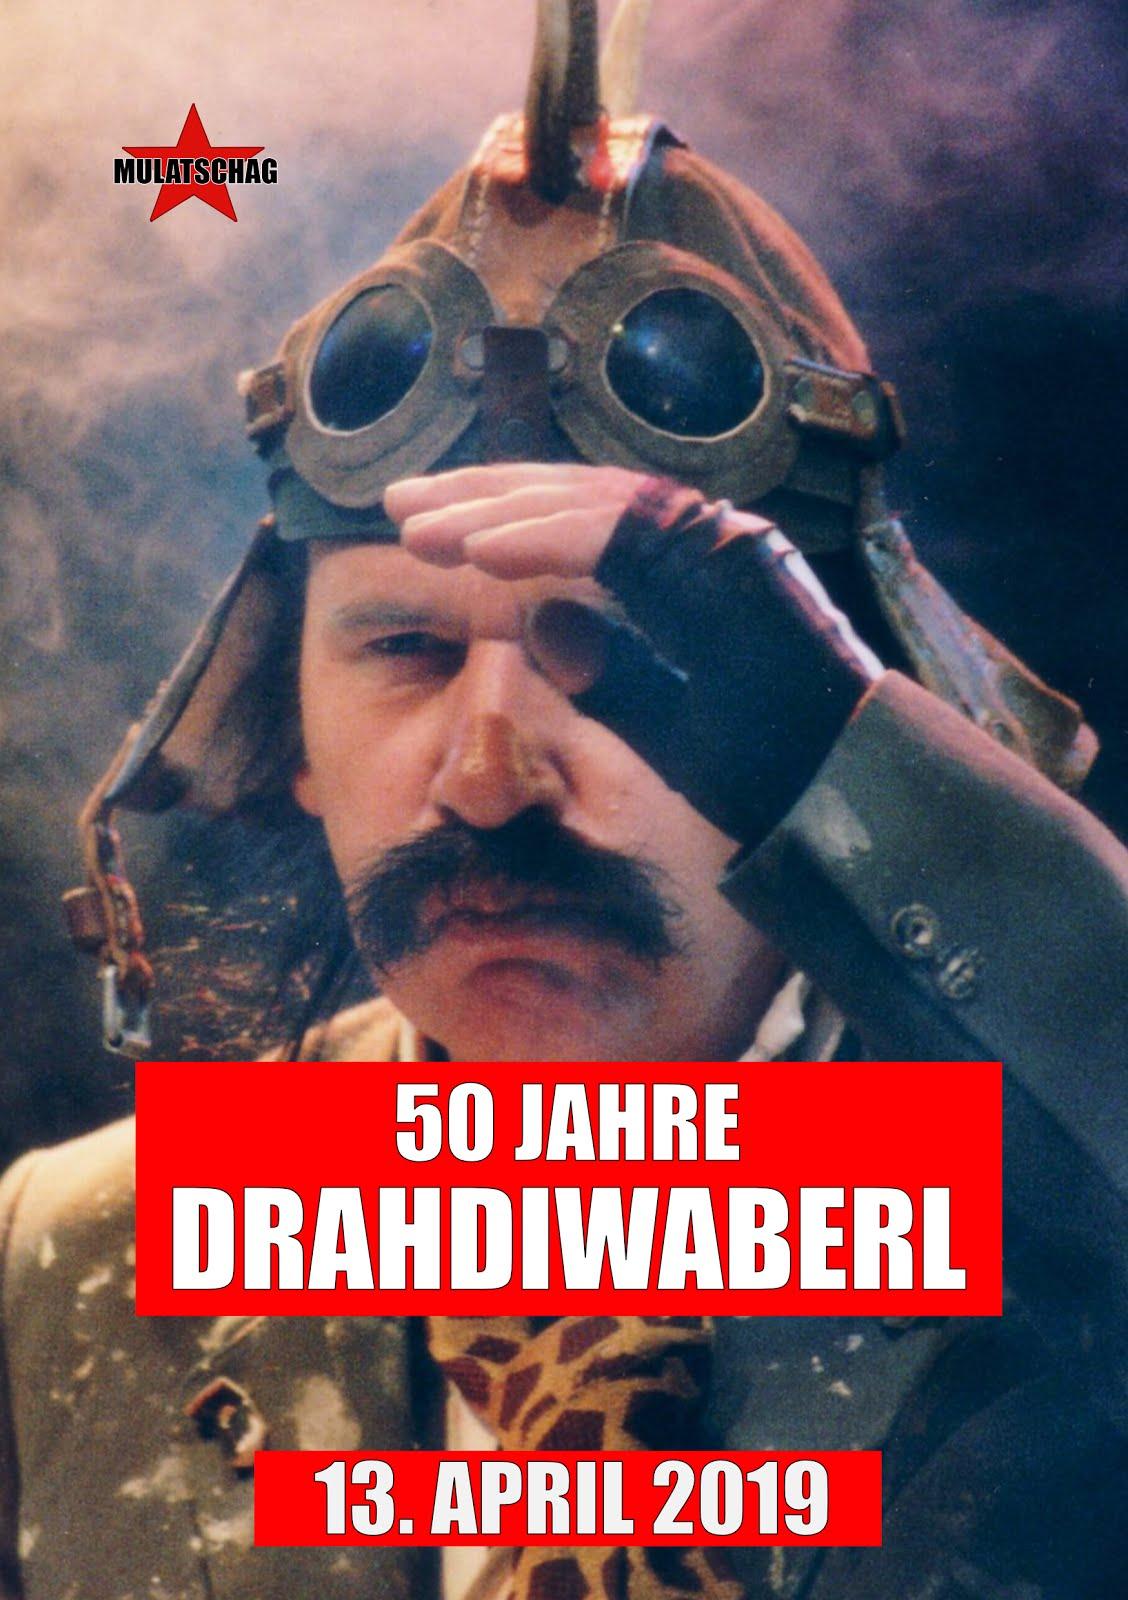 DRAHDIWABERL!